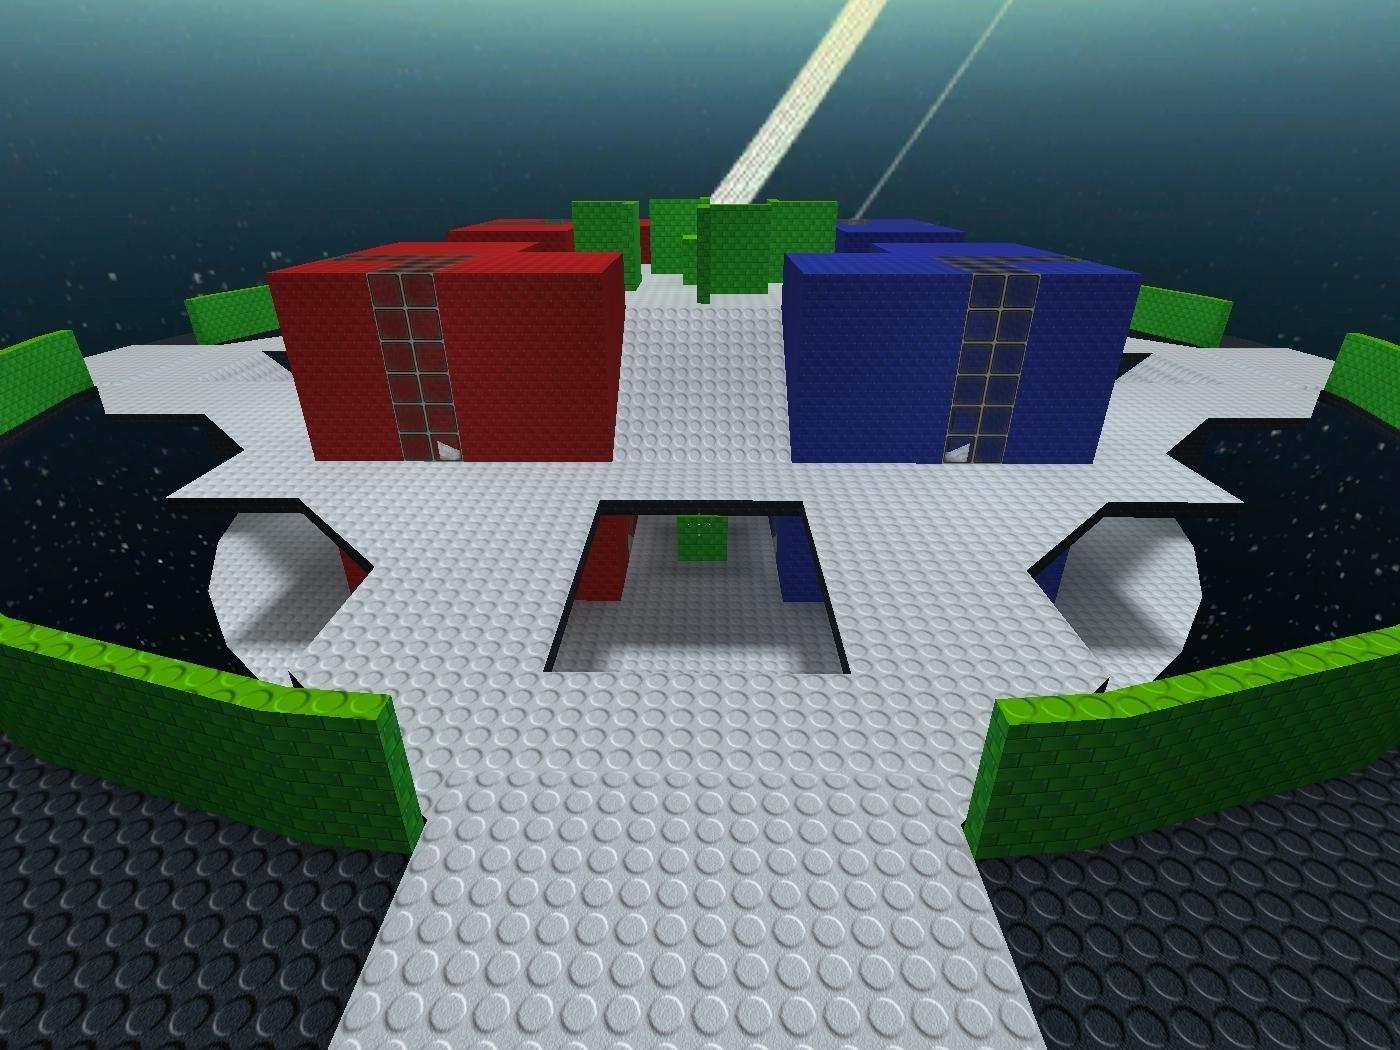 http://endgegner.fightercom.de/CounterStrikeGlobalOffensive/screen-gg_lego_spacetower21.jpg